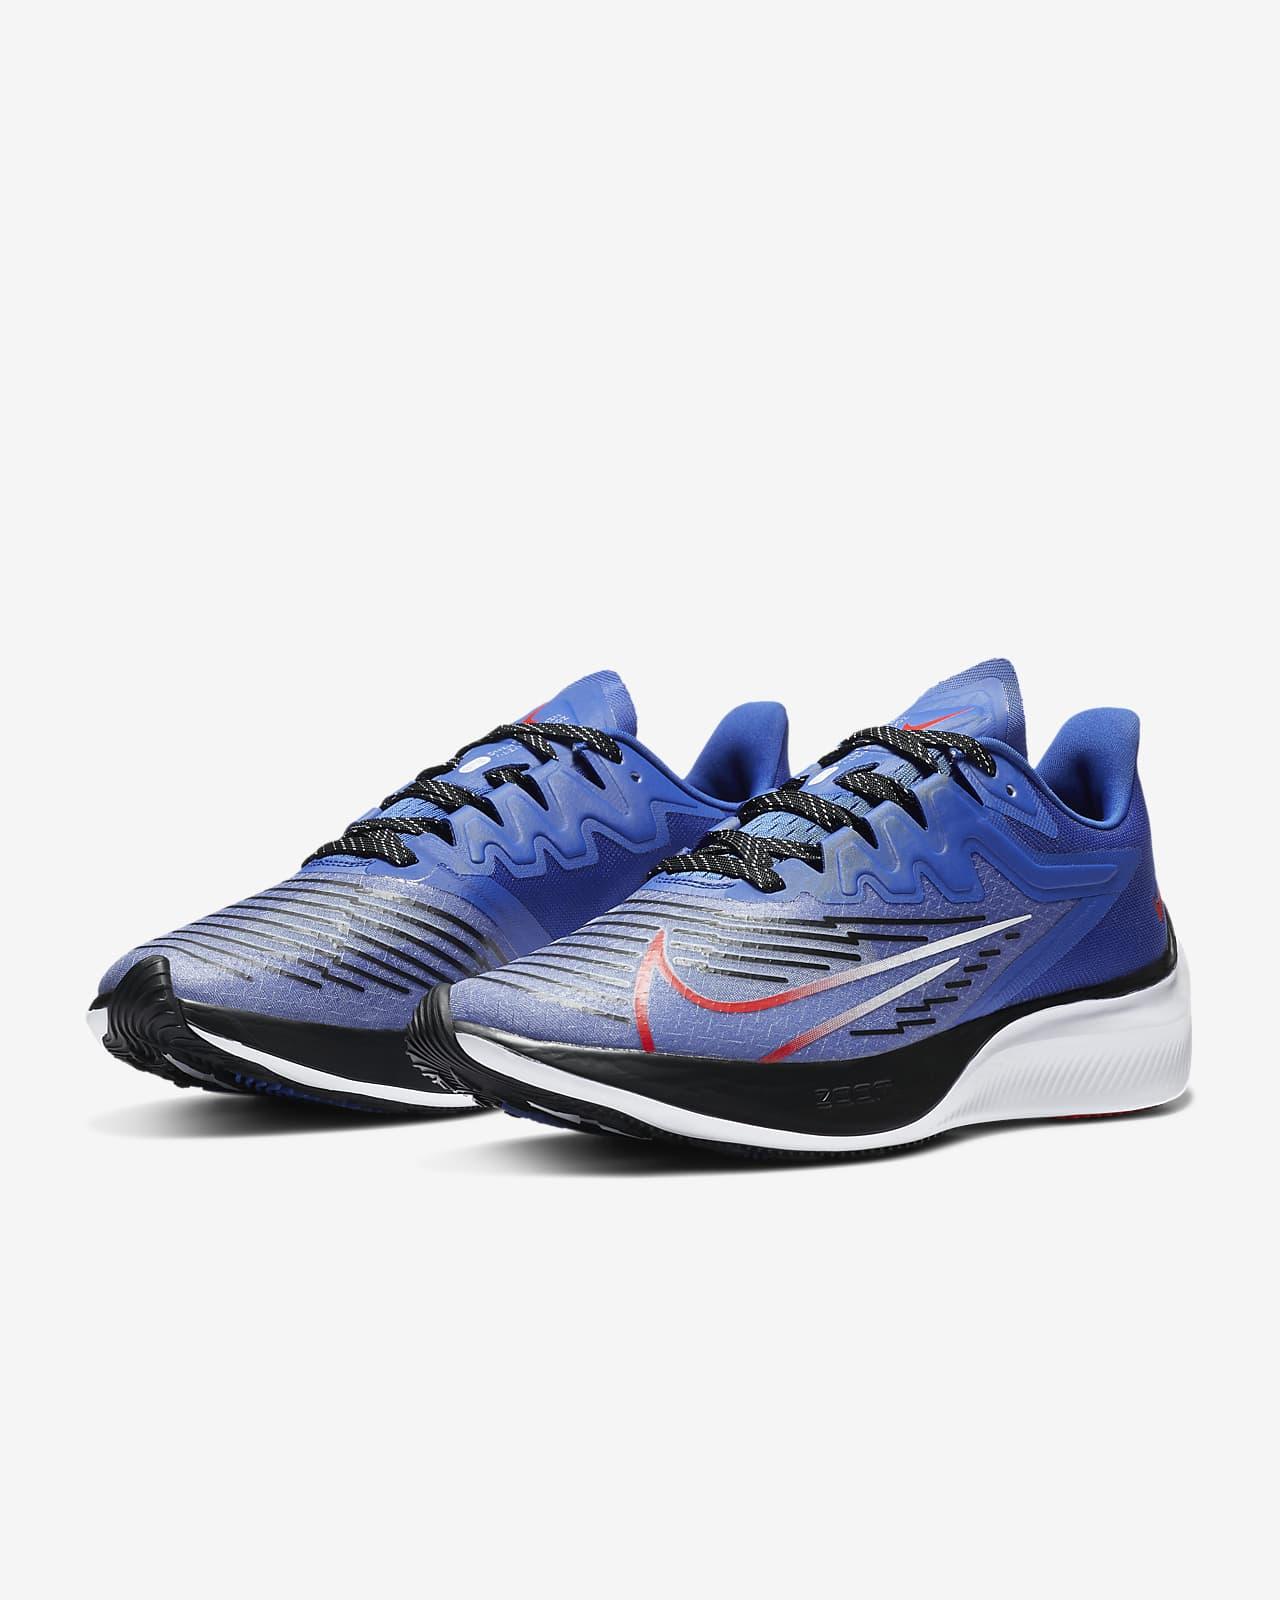 Nike Zoom Gravity 2 Men's Running Shoe